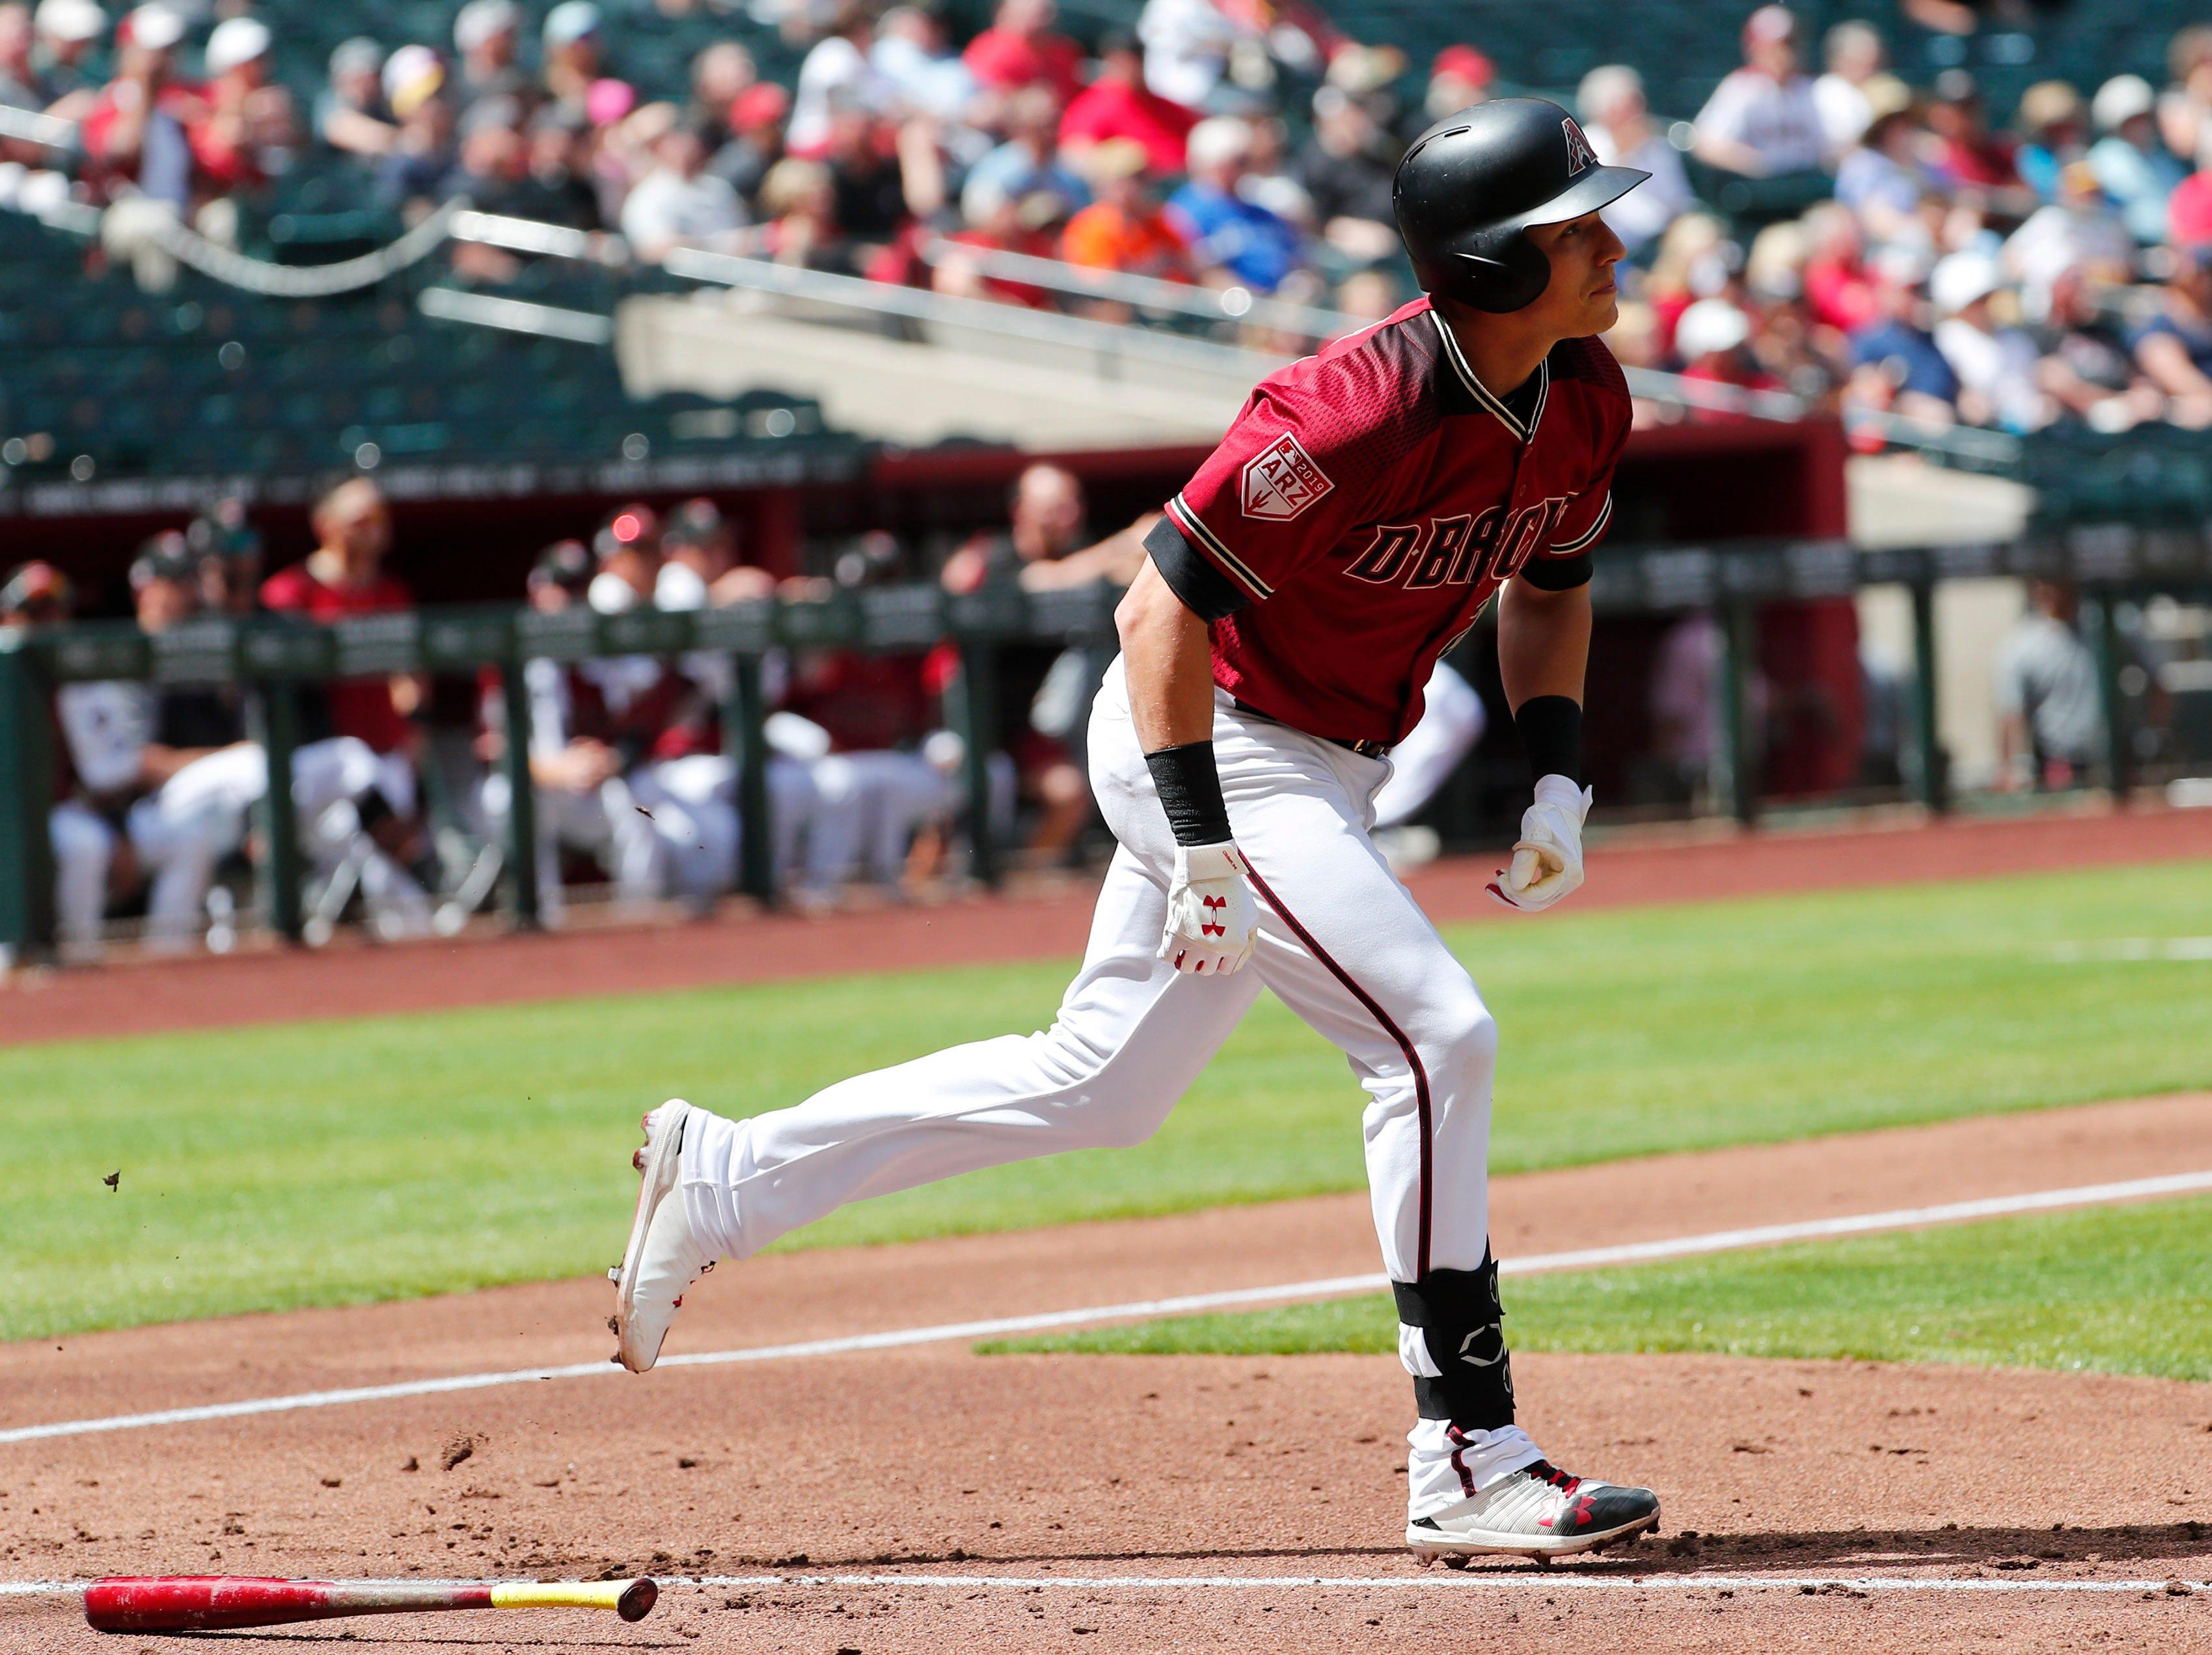 Arizona Diamondbacks first baseman Jake Lamb (22) hits a home run against the Chicago White Sox during spring training action at Chase Field March 26, 2019.